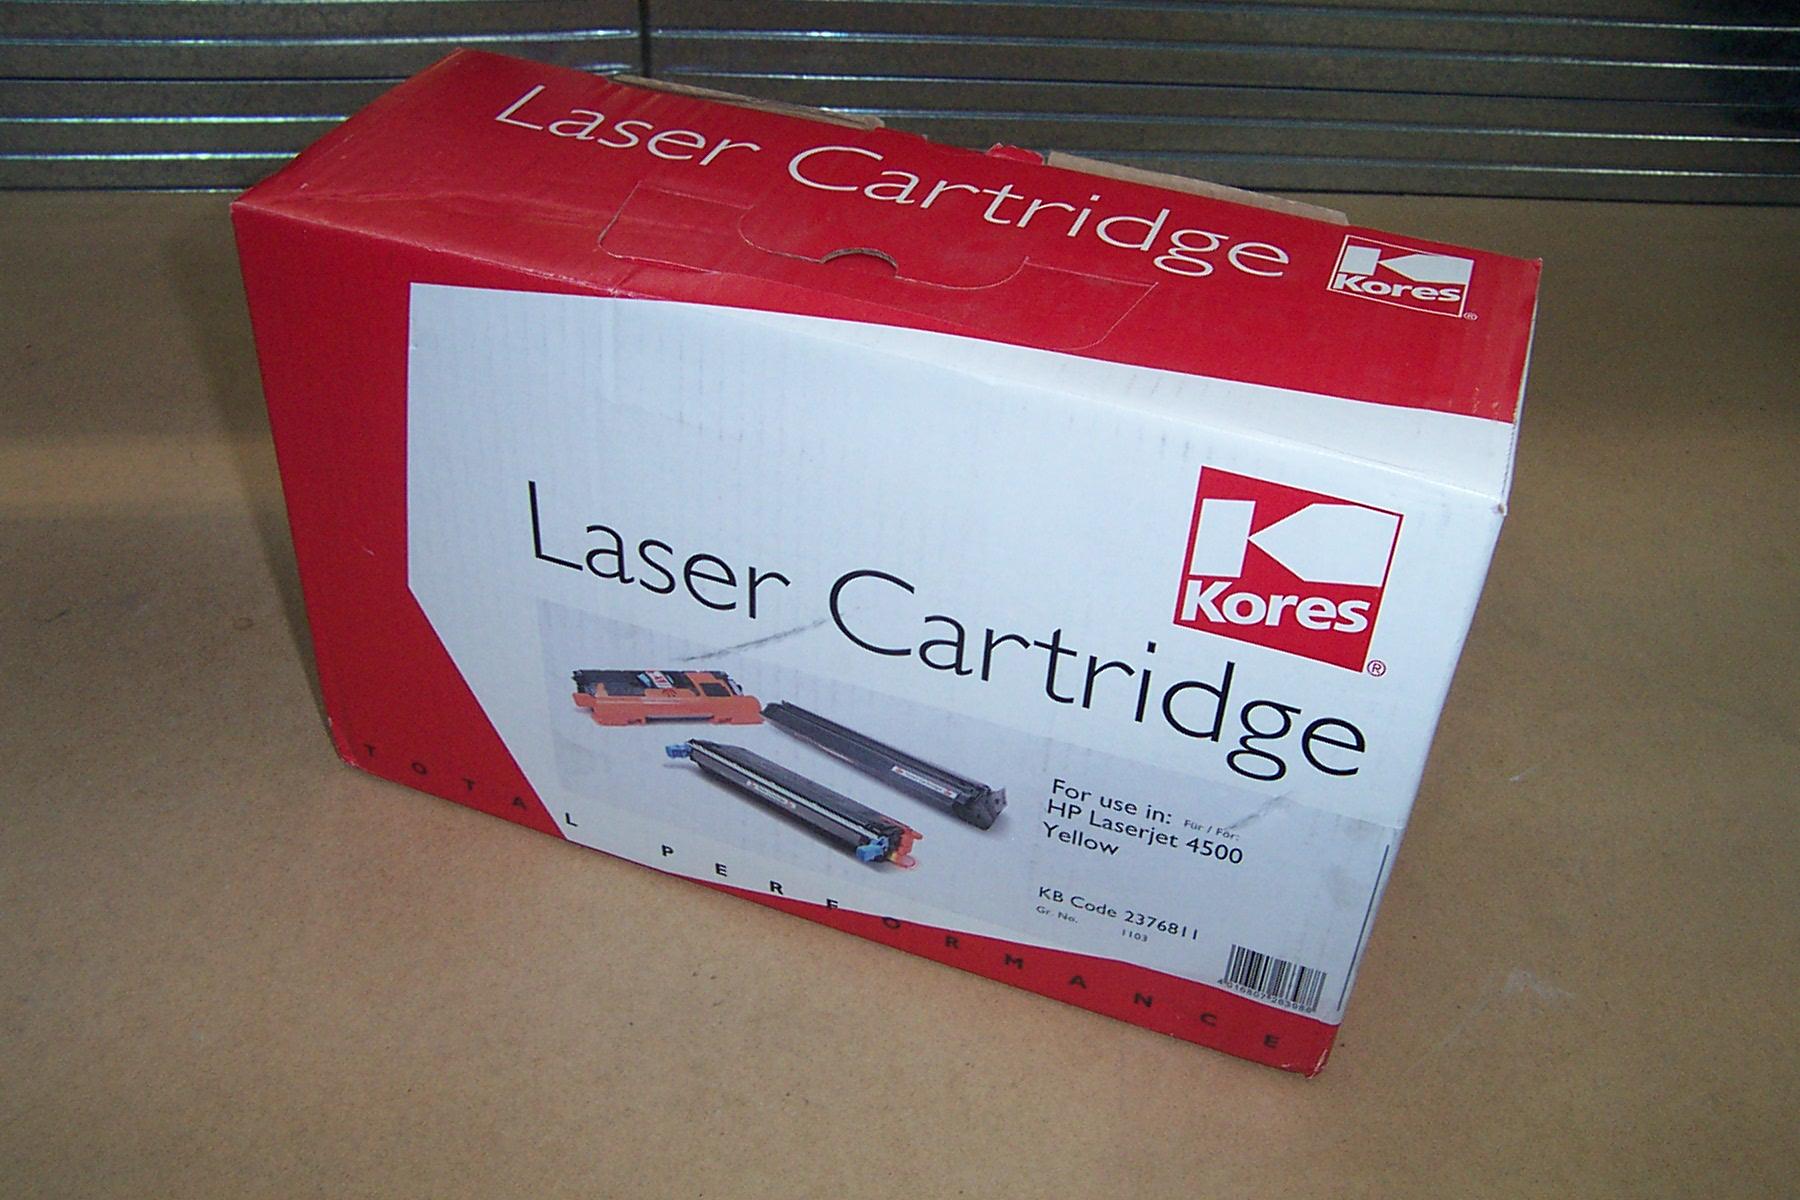 Kores 2376811 Yellow Toner Cartridge for HP LaserJet 4500 Yellow